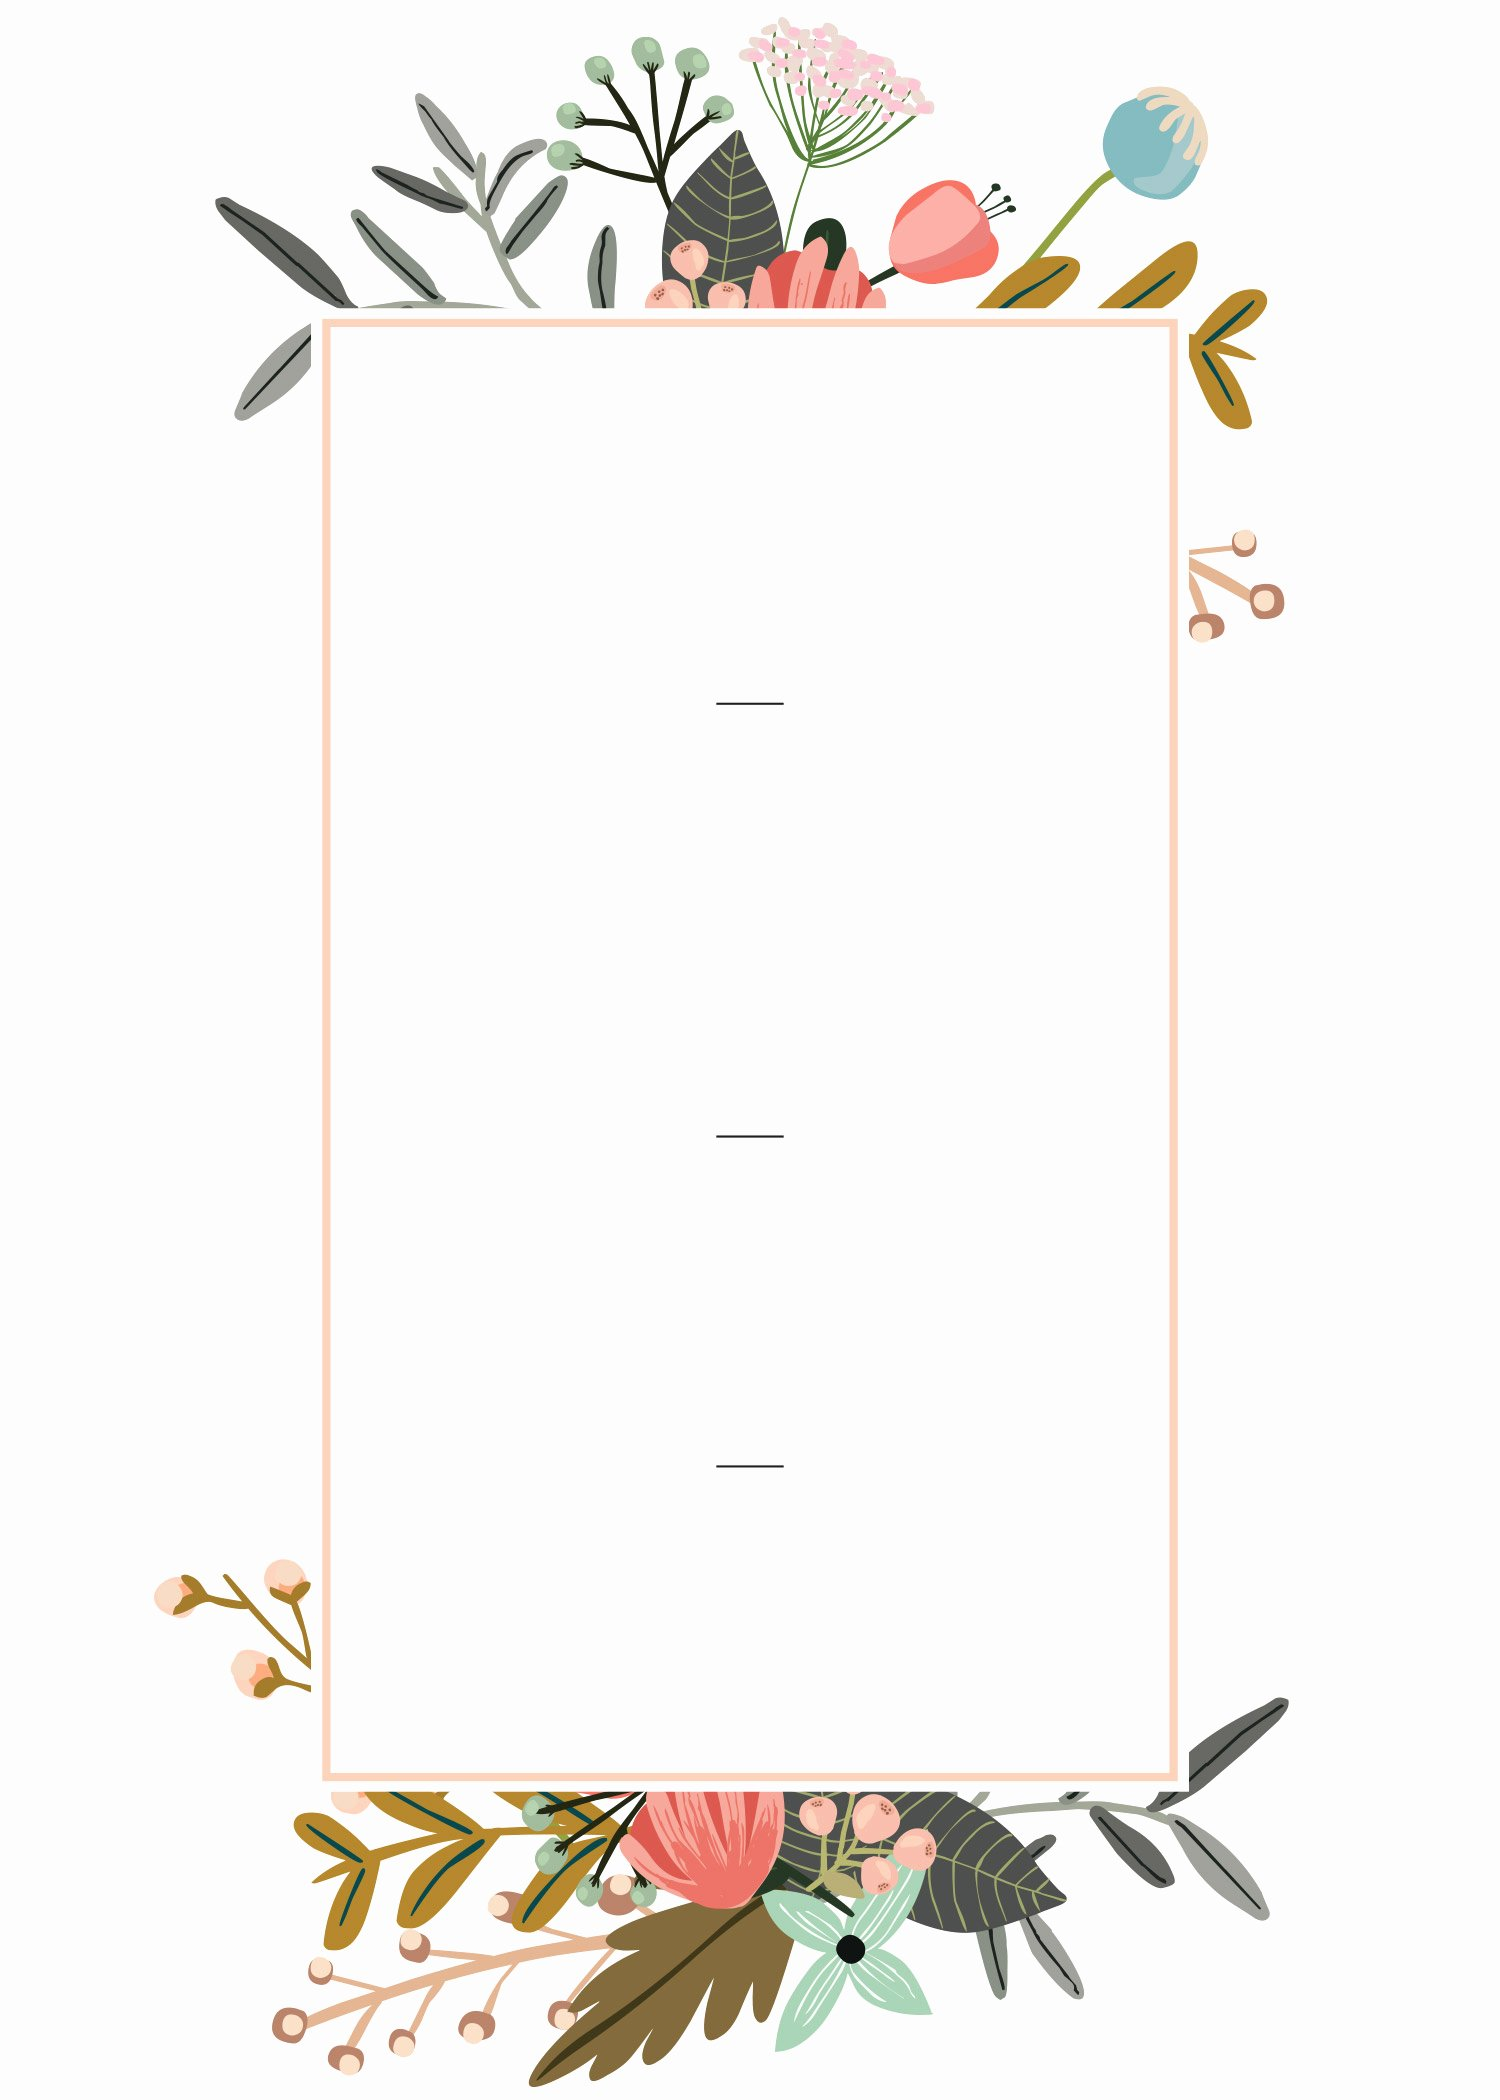 Editable Wedding Invitation Templates for the Perfect Card